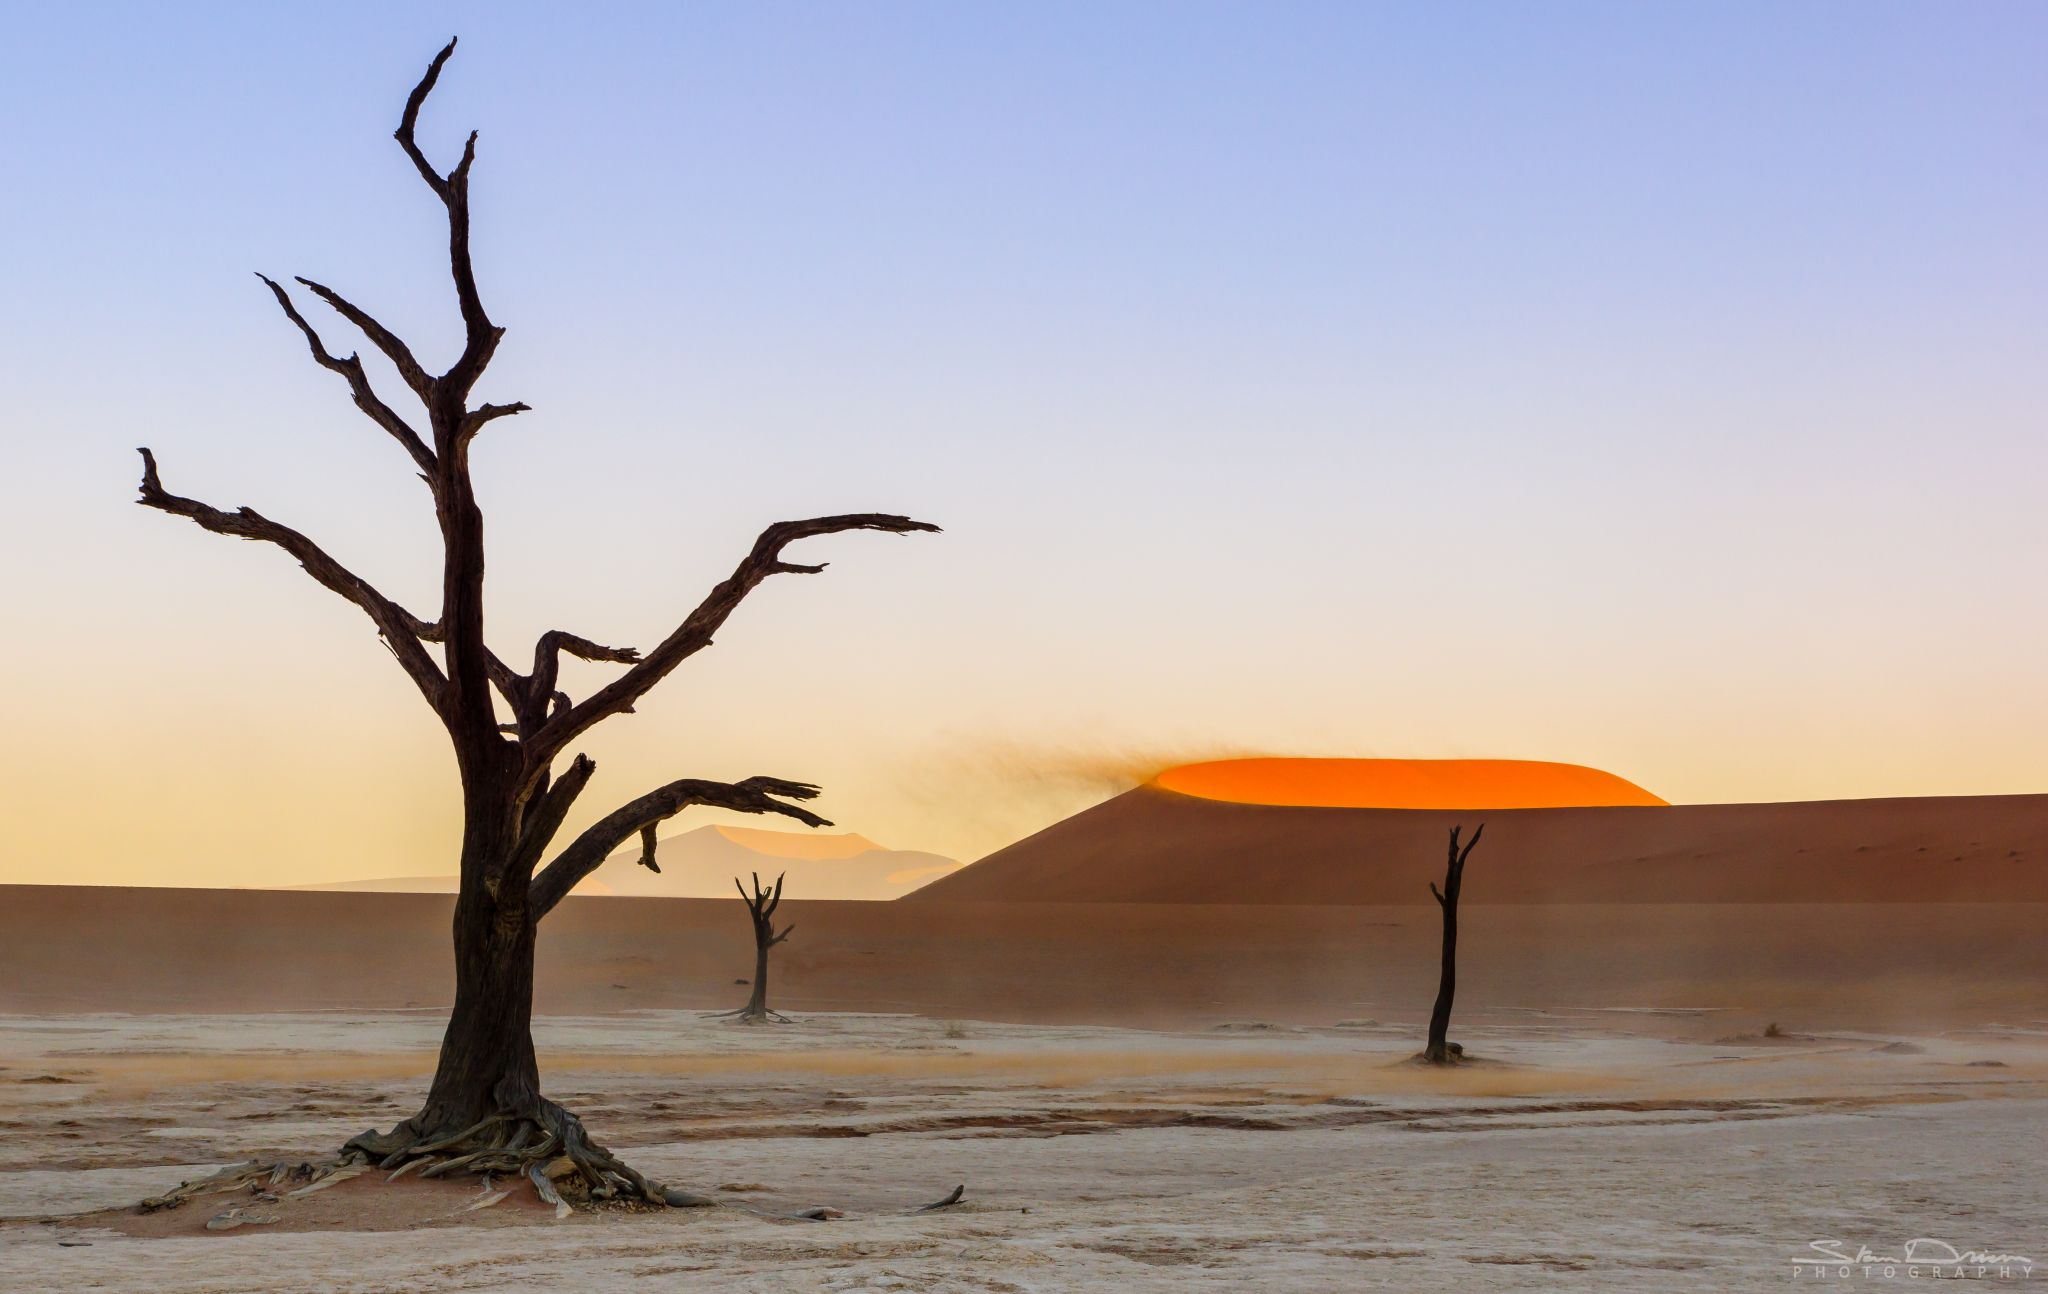 Windy Deadvlei, Namibia